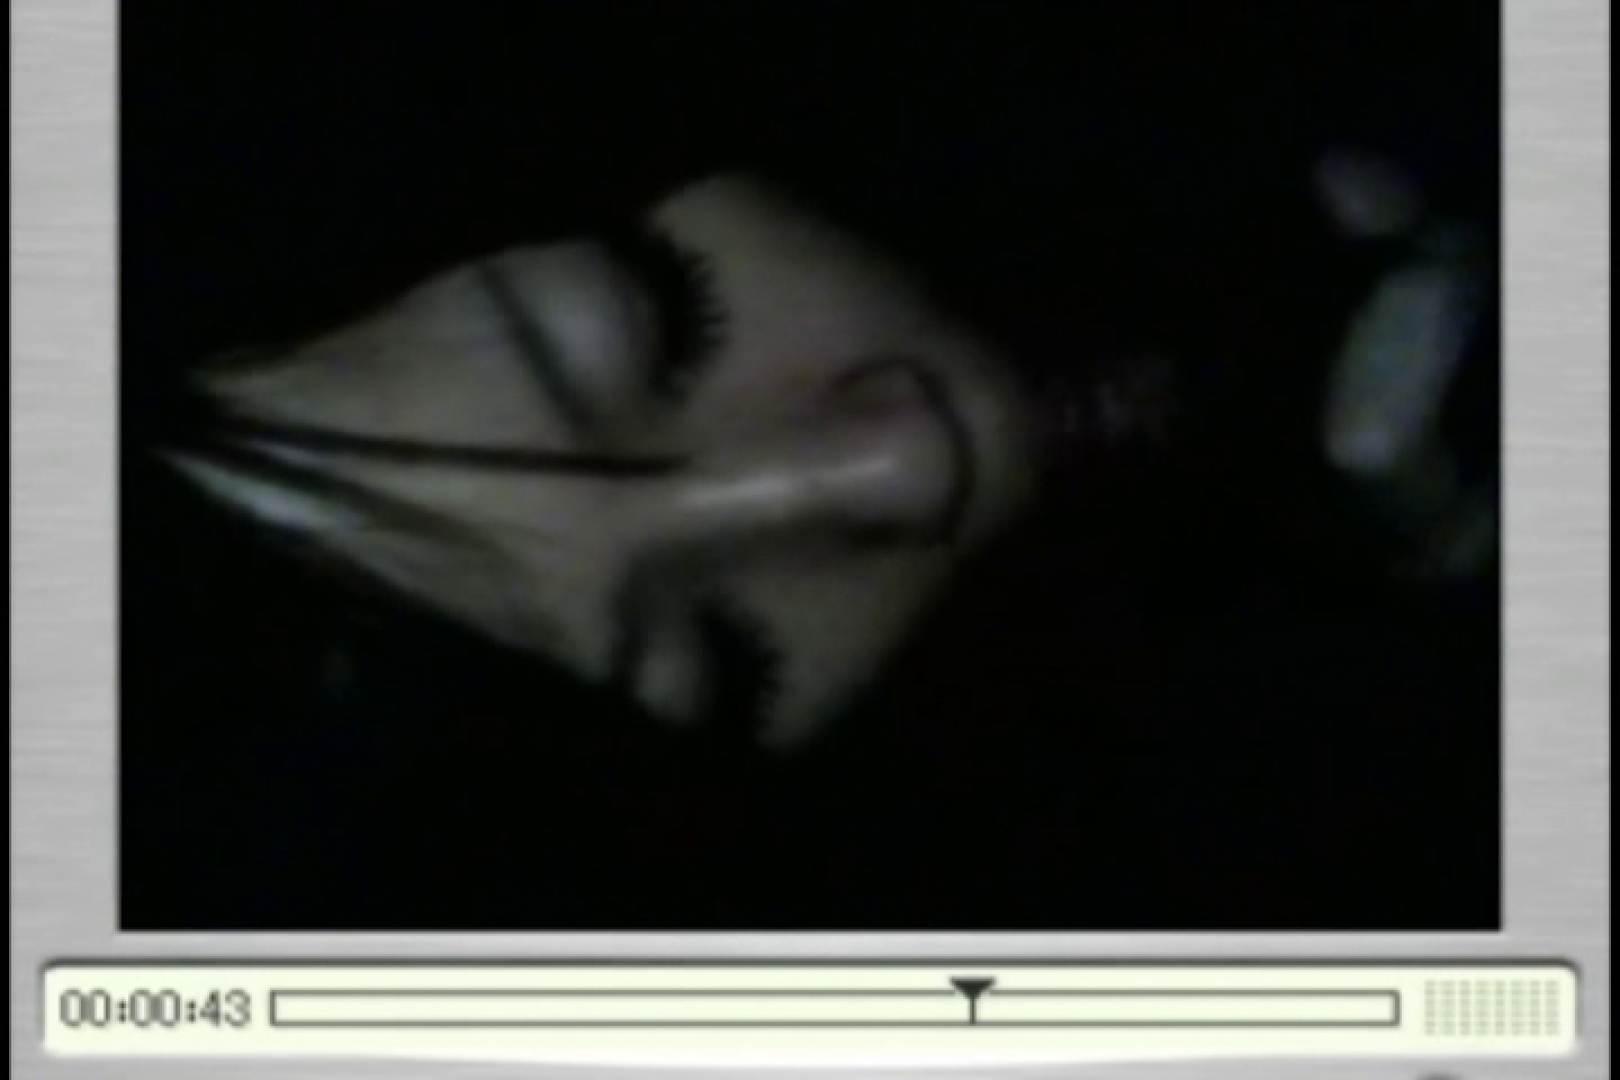 Shigeruのアルバム 流出作品  98pic 4